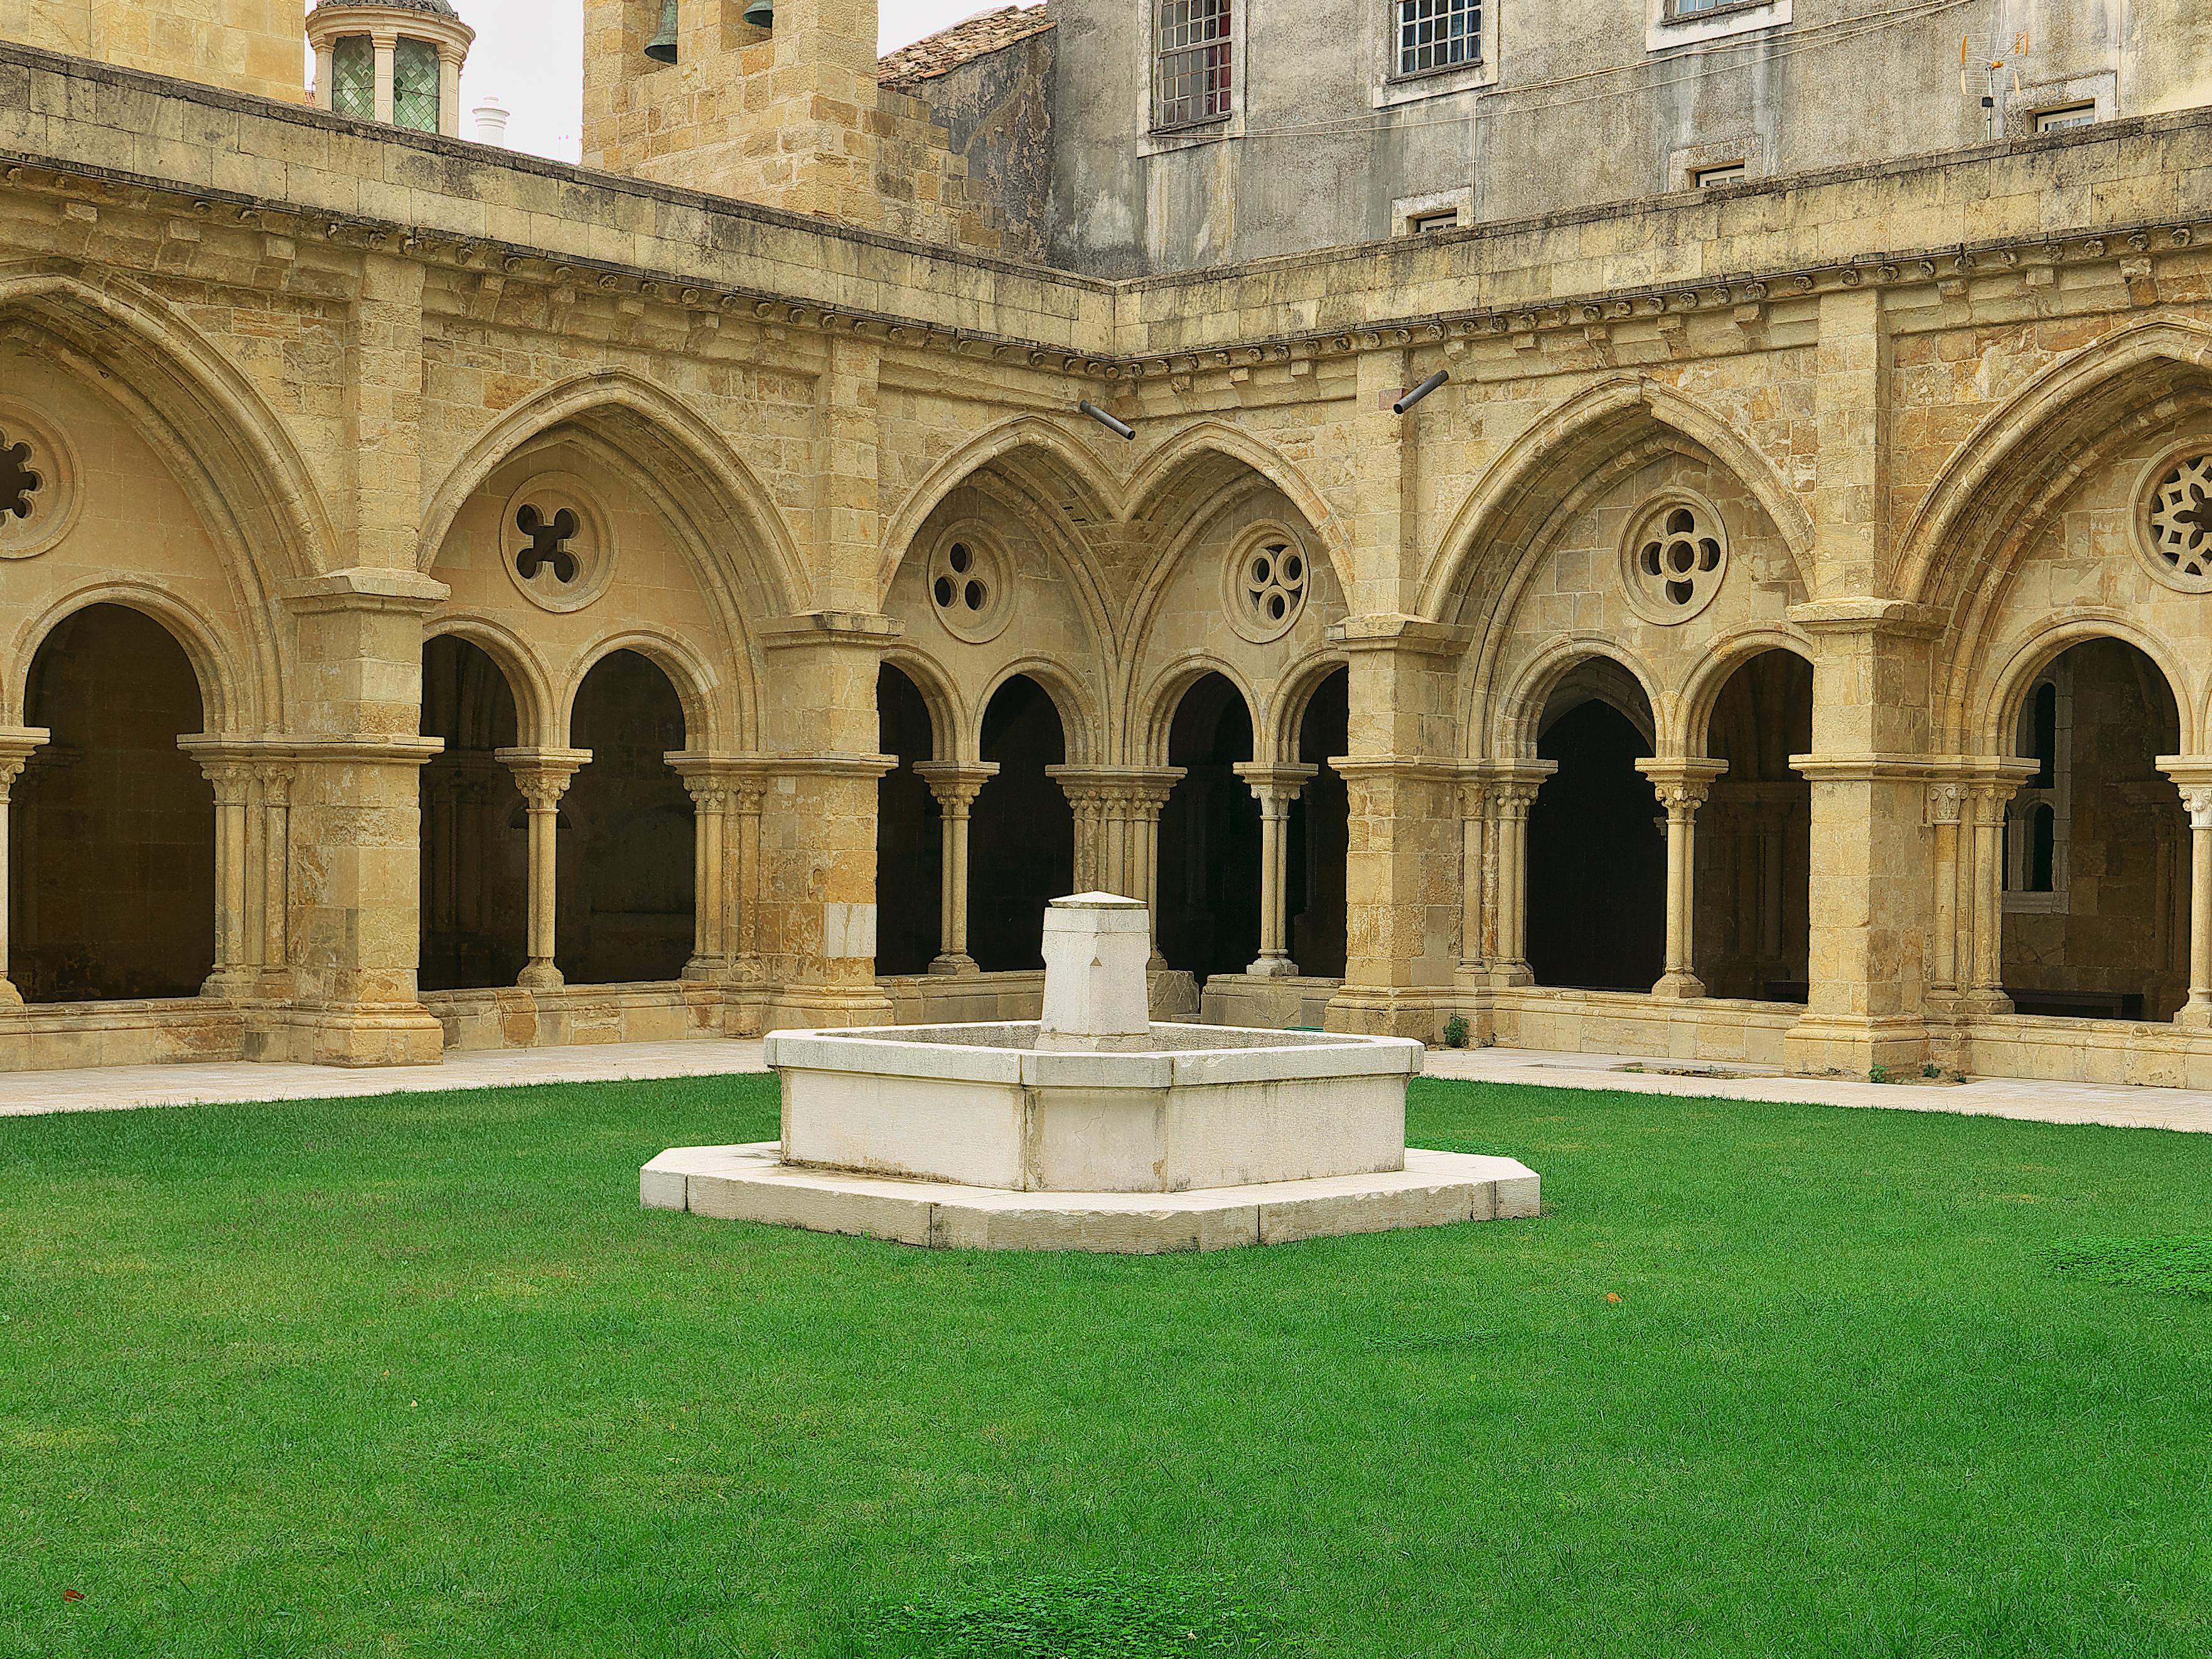 Small Church Organizational Chart: Portuguese Romanesque architecture - Wikipedia,Chart